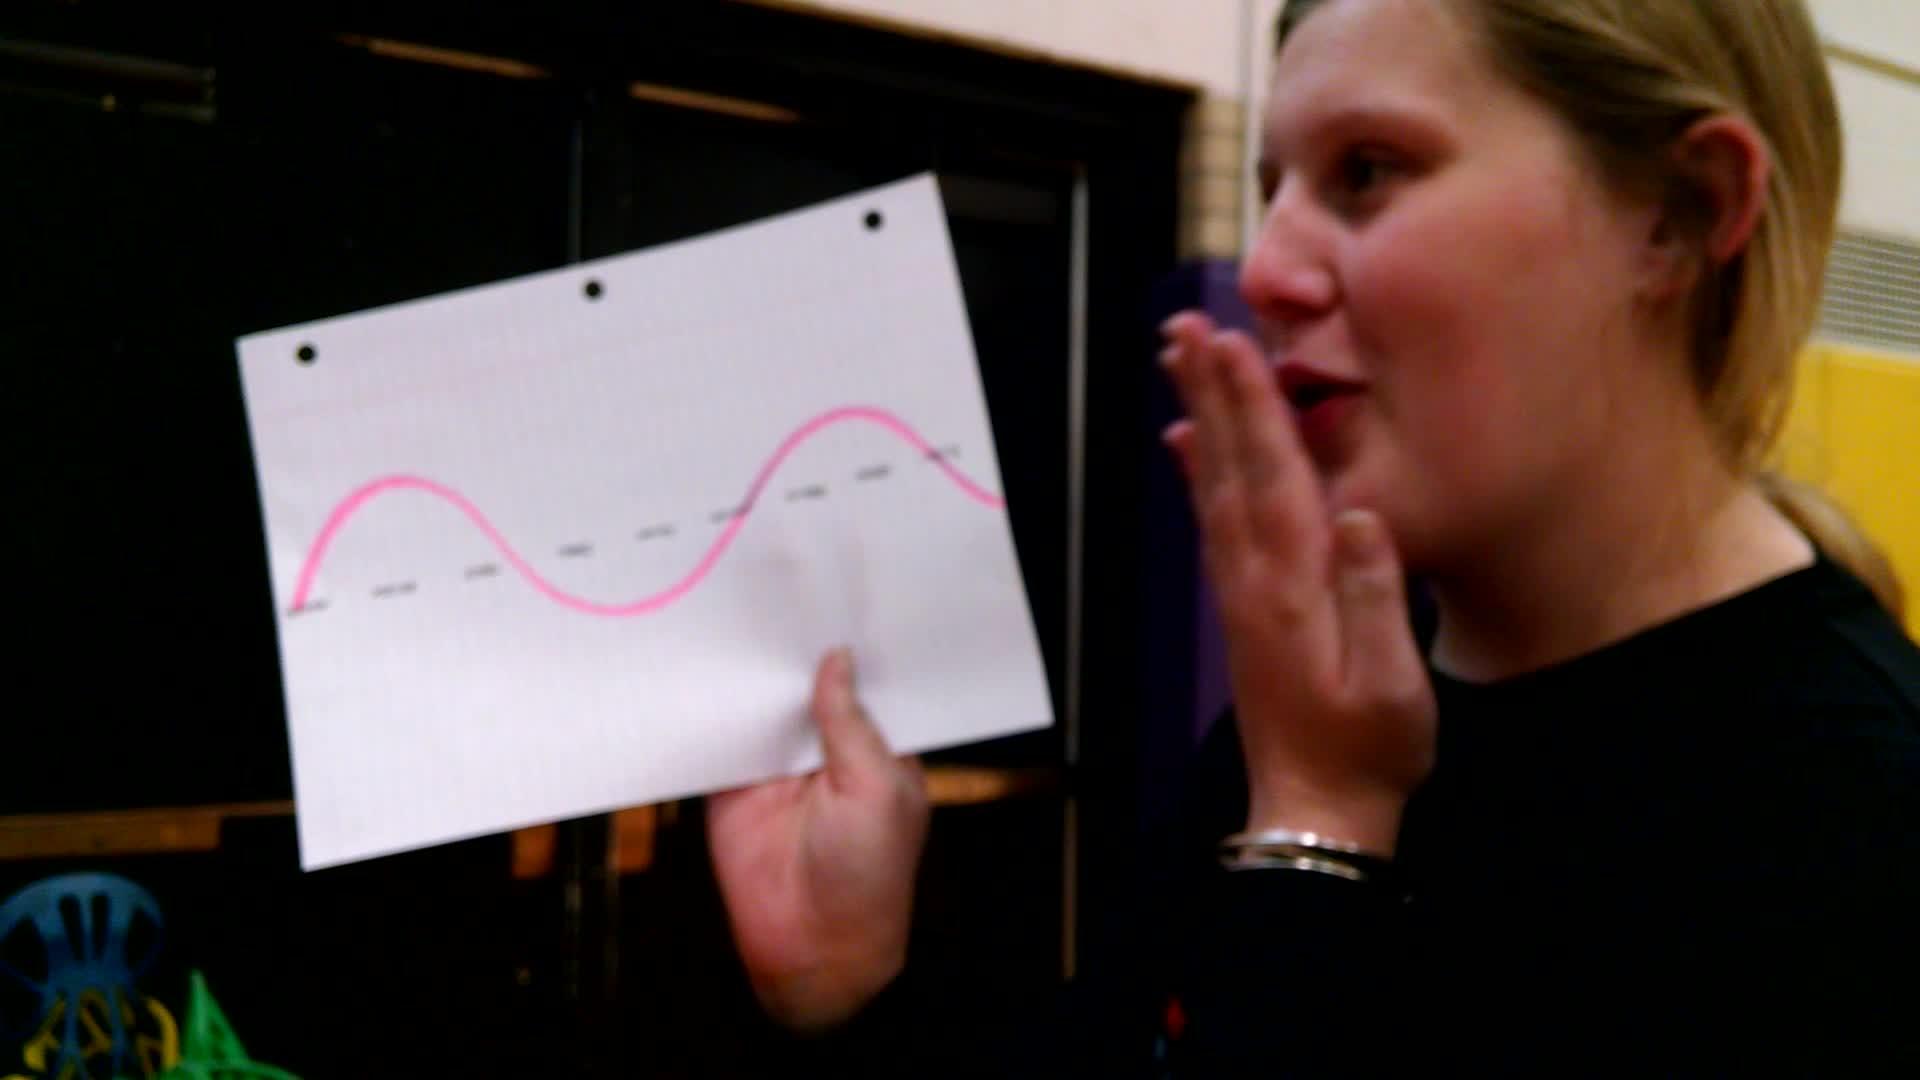 Constructive interference: A sound wave story